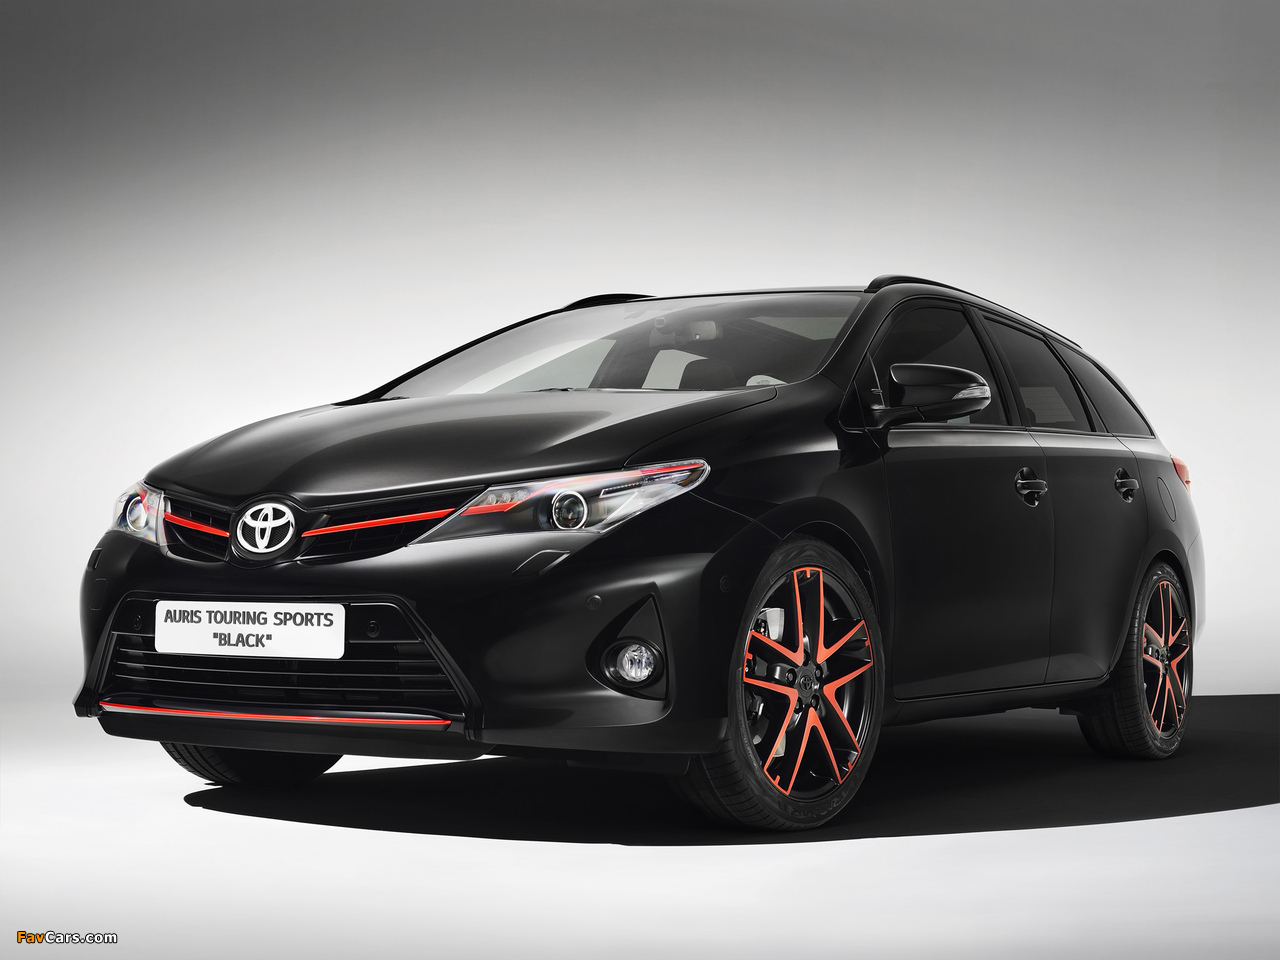 Photos of Toyota Auris Touring Sports Black Concept 2013 (1280 x 960)